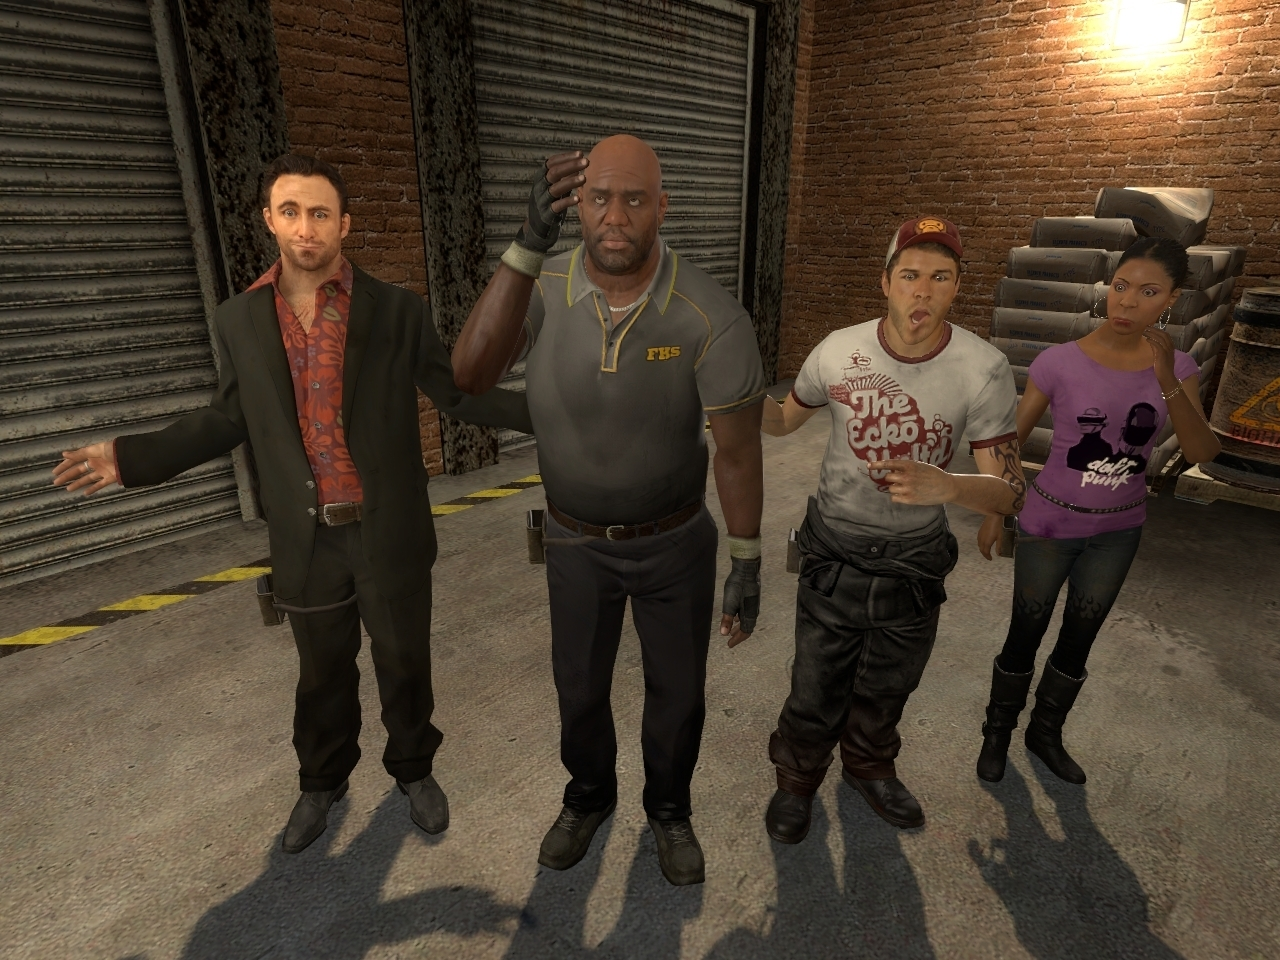 The gang together